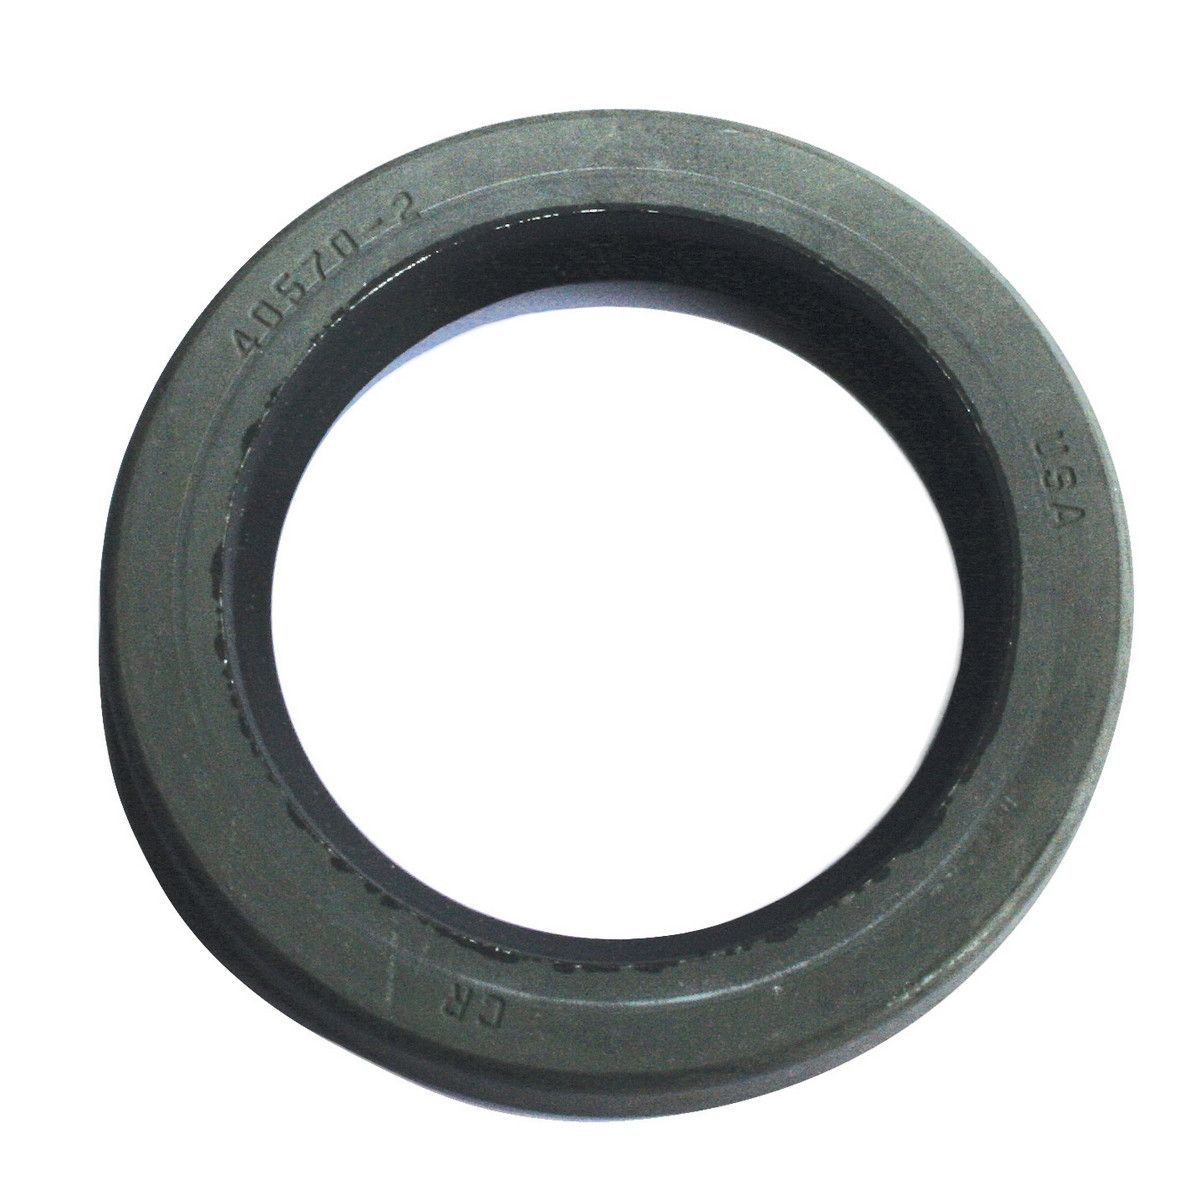 axle oil seal inner right 84 95 jeep cherokee wrangler xj yj [ 1200 x 1200 Pixel ]